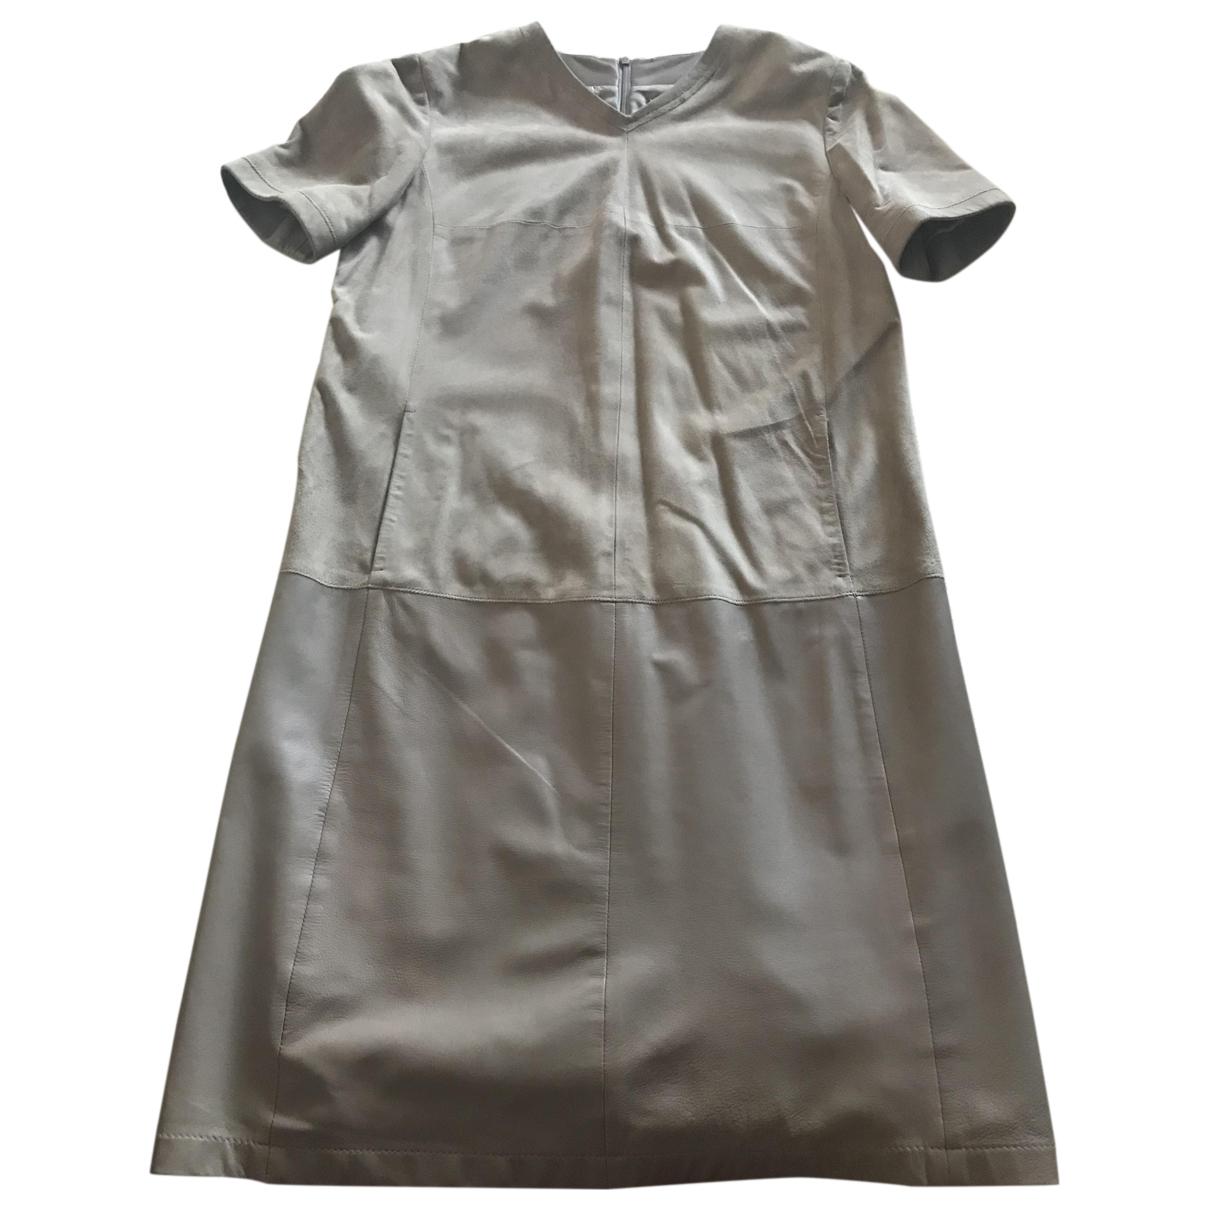 Max Mara 's \N Beige Leather dress for Women 44 IT